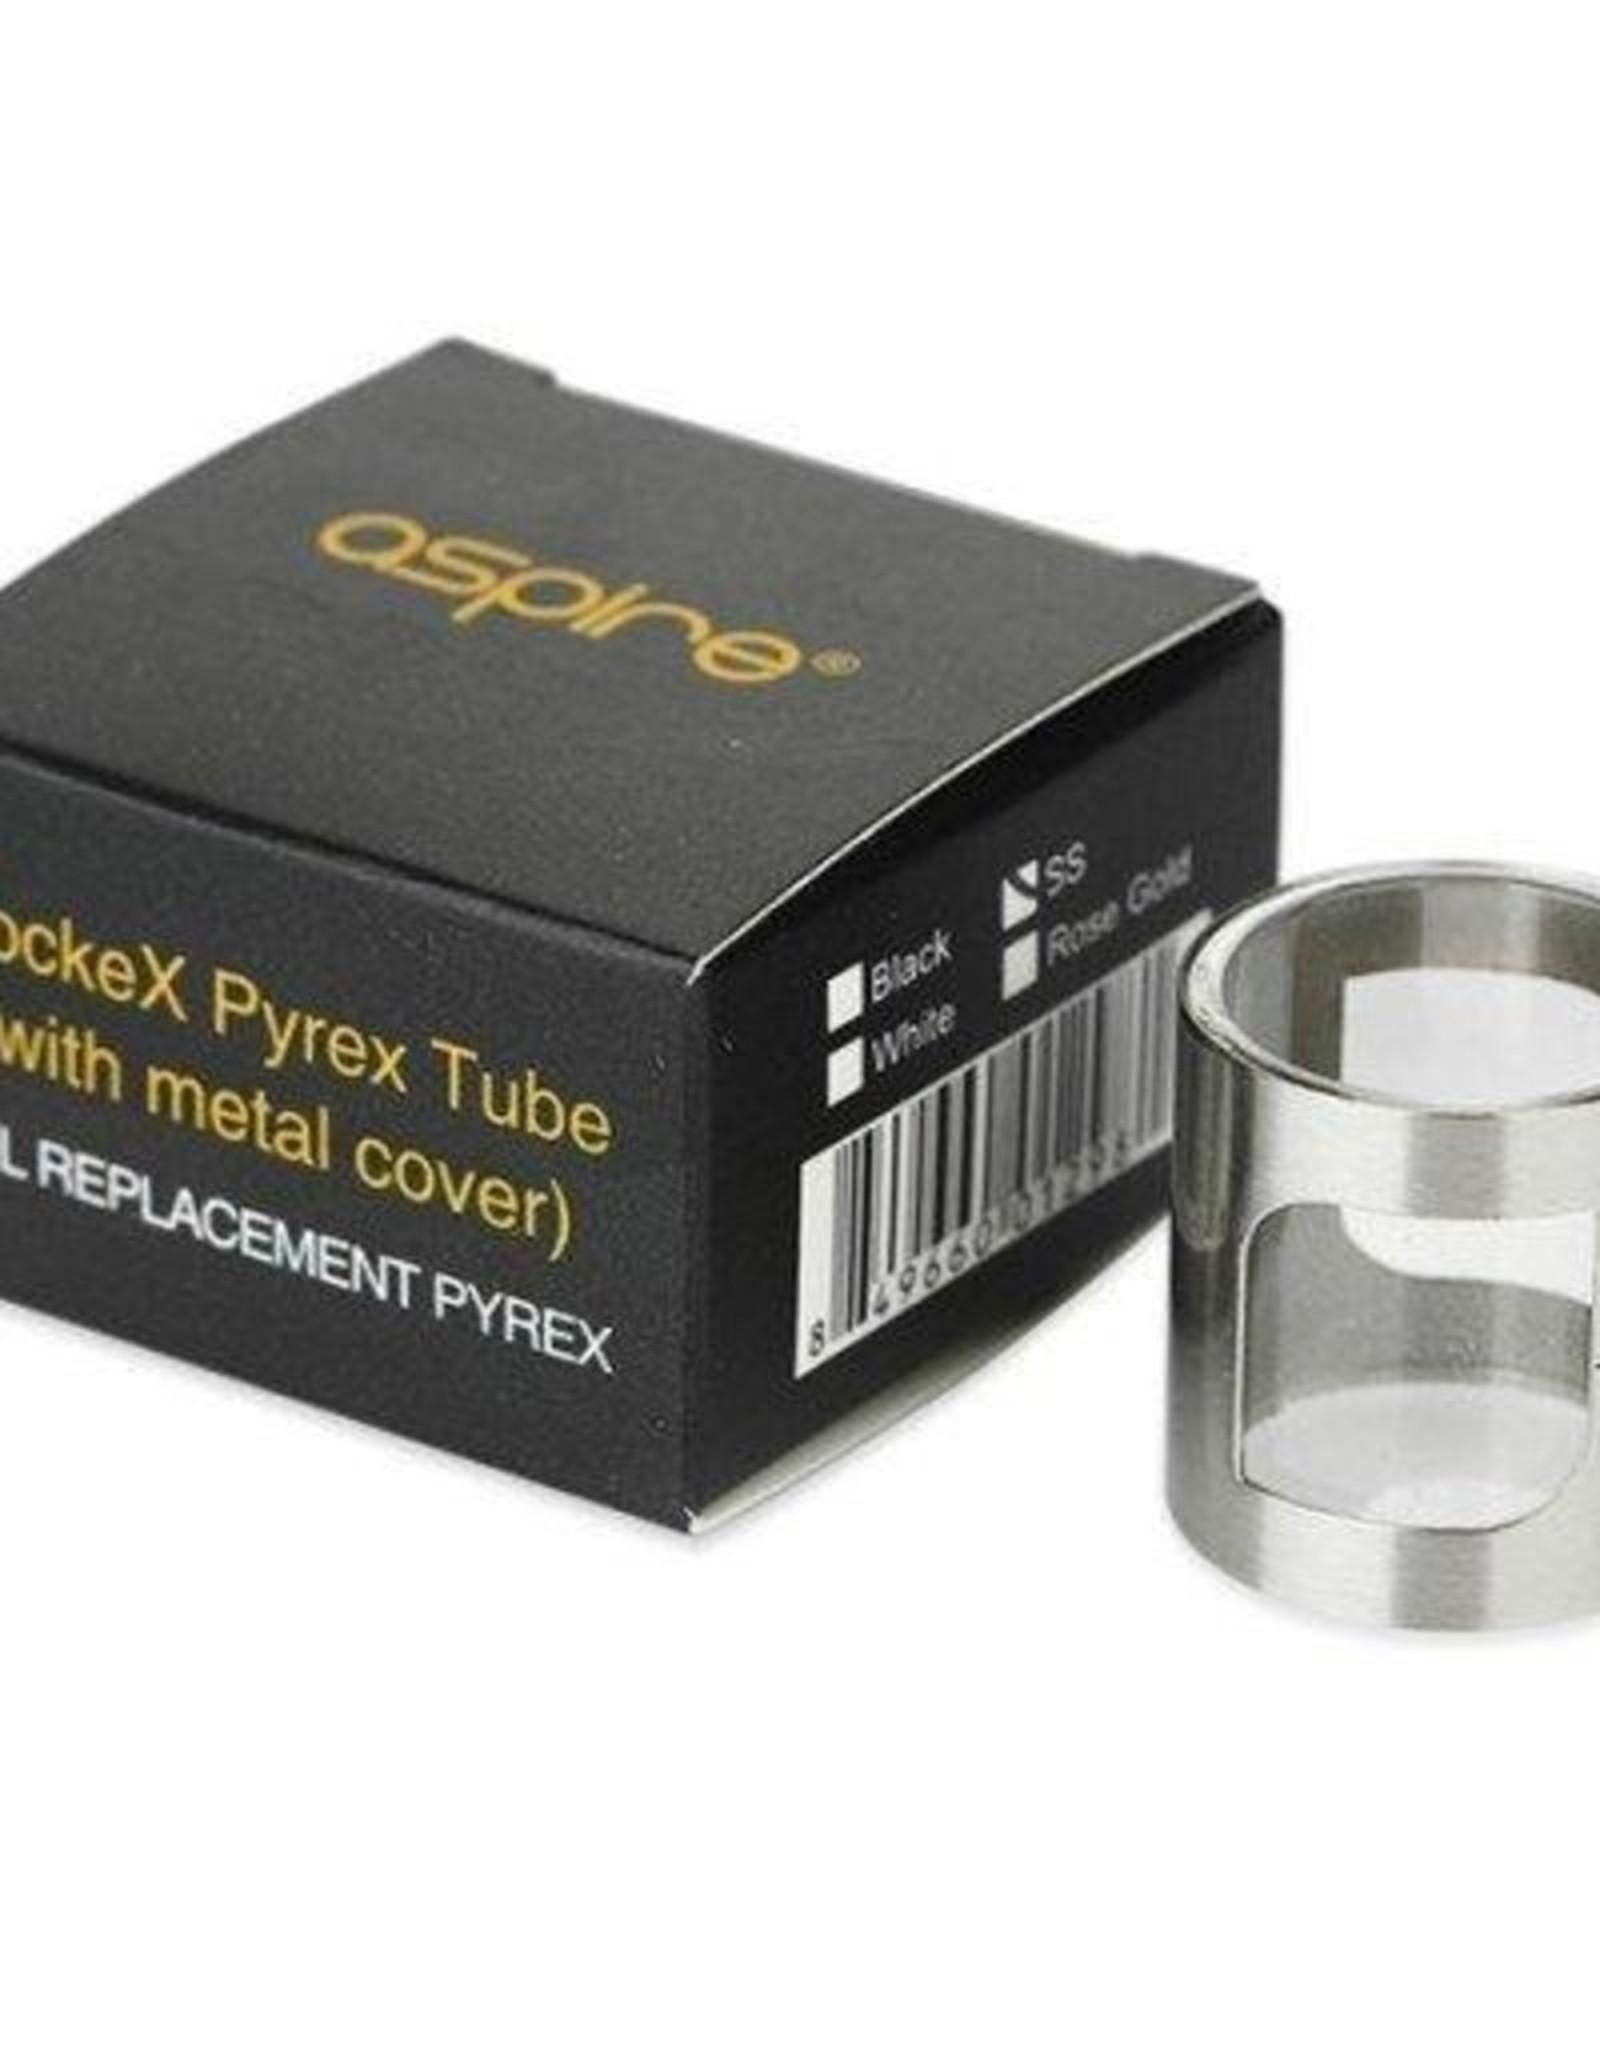 Aspire Aspire Pockex Replacement Glass